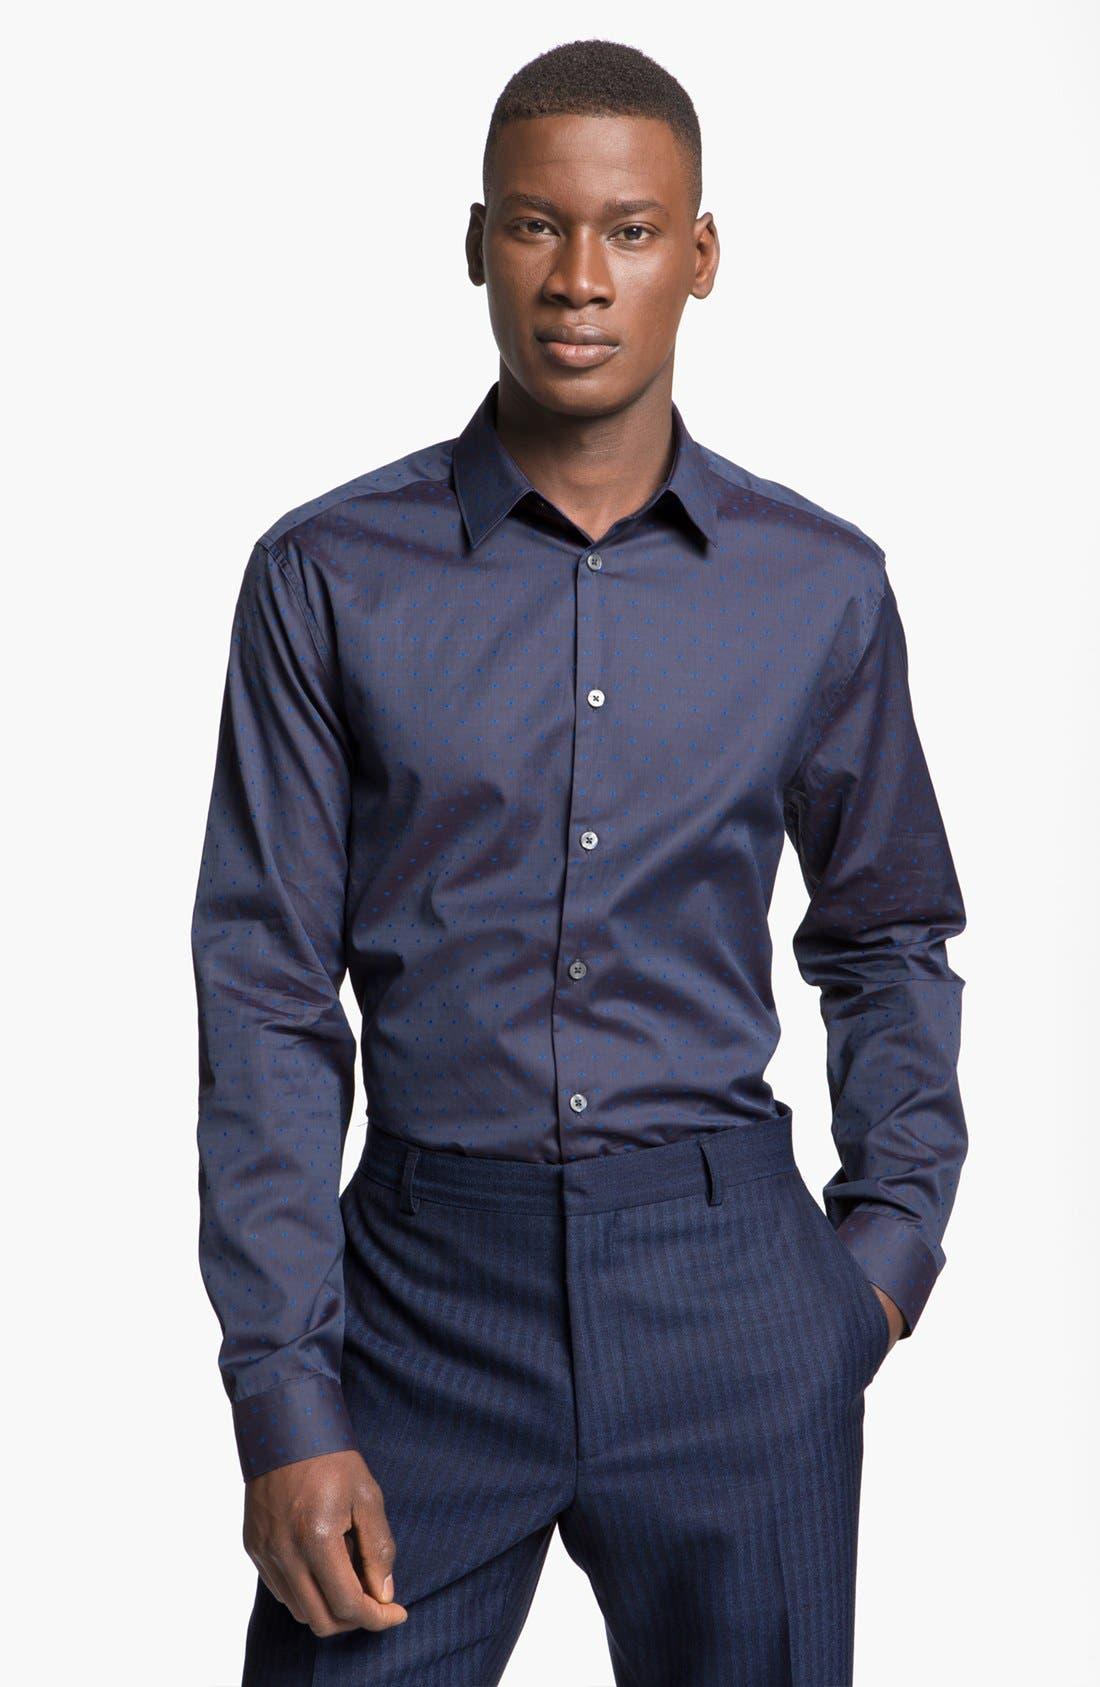 Alternate Image 1 Selected - Paul Smith London Slim Fit Dot Print Dress Shirt